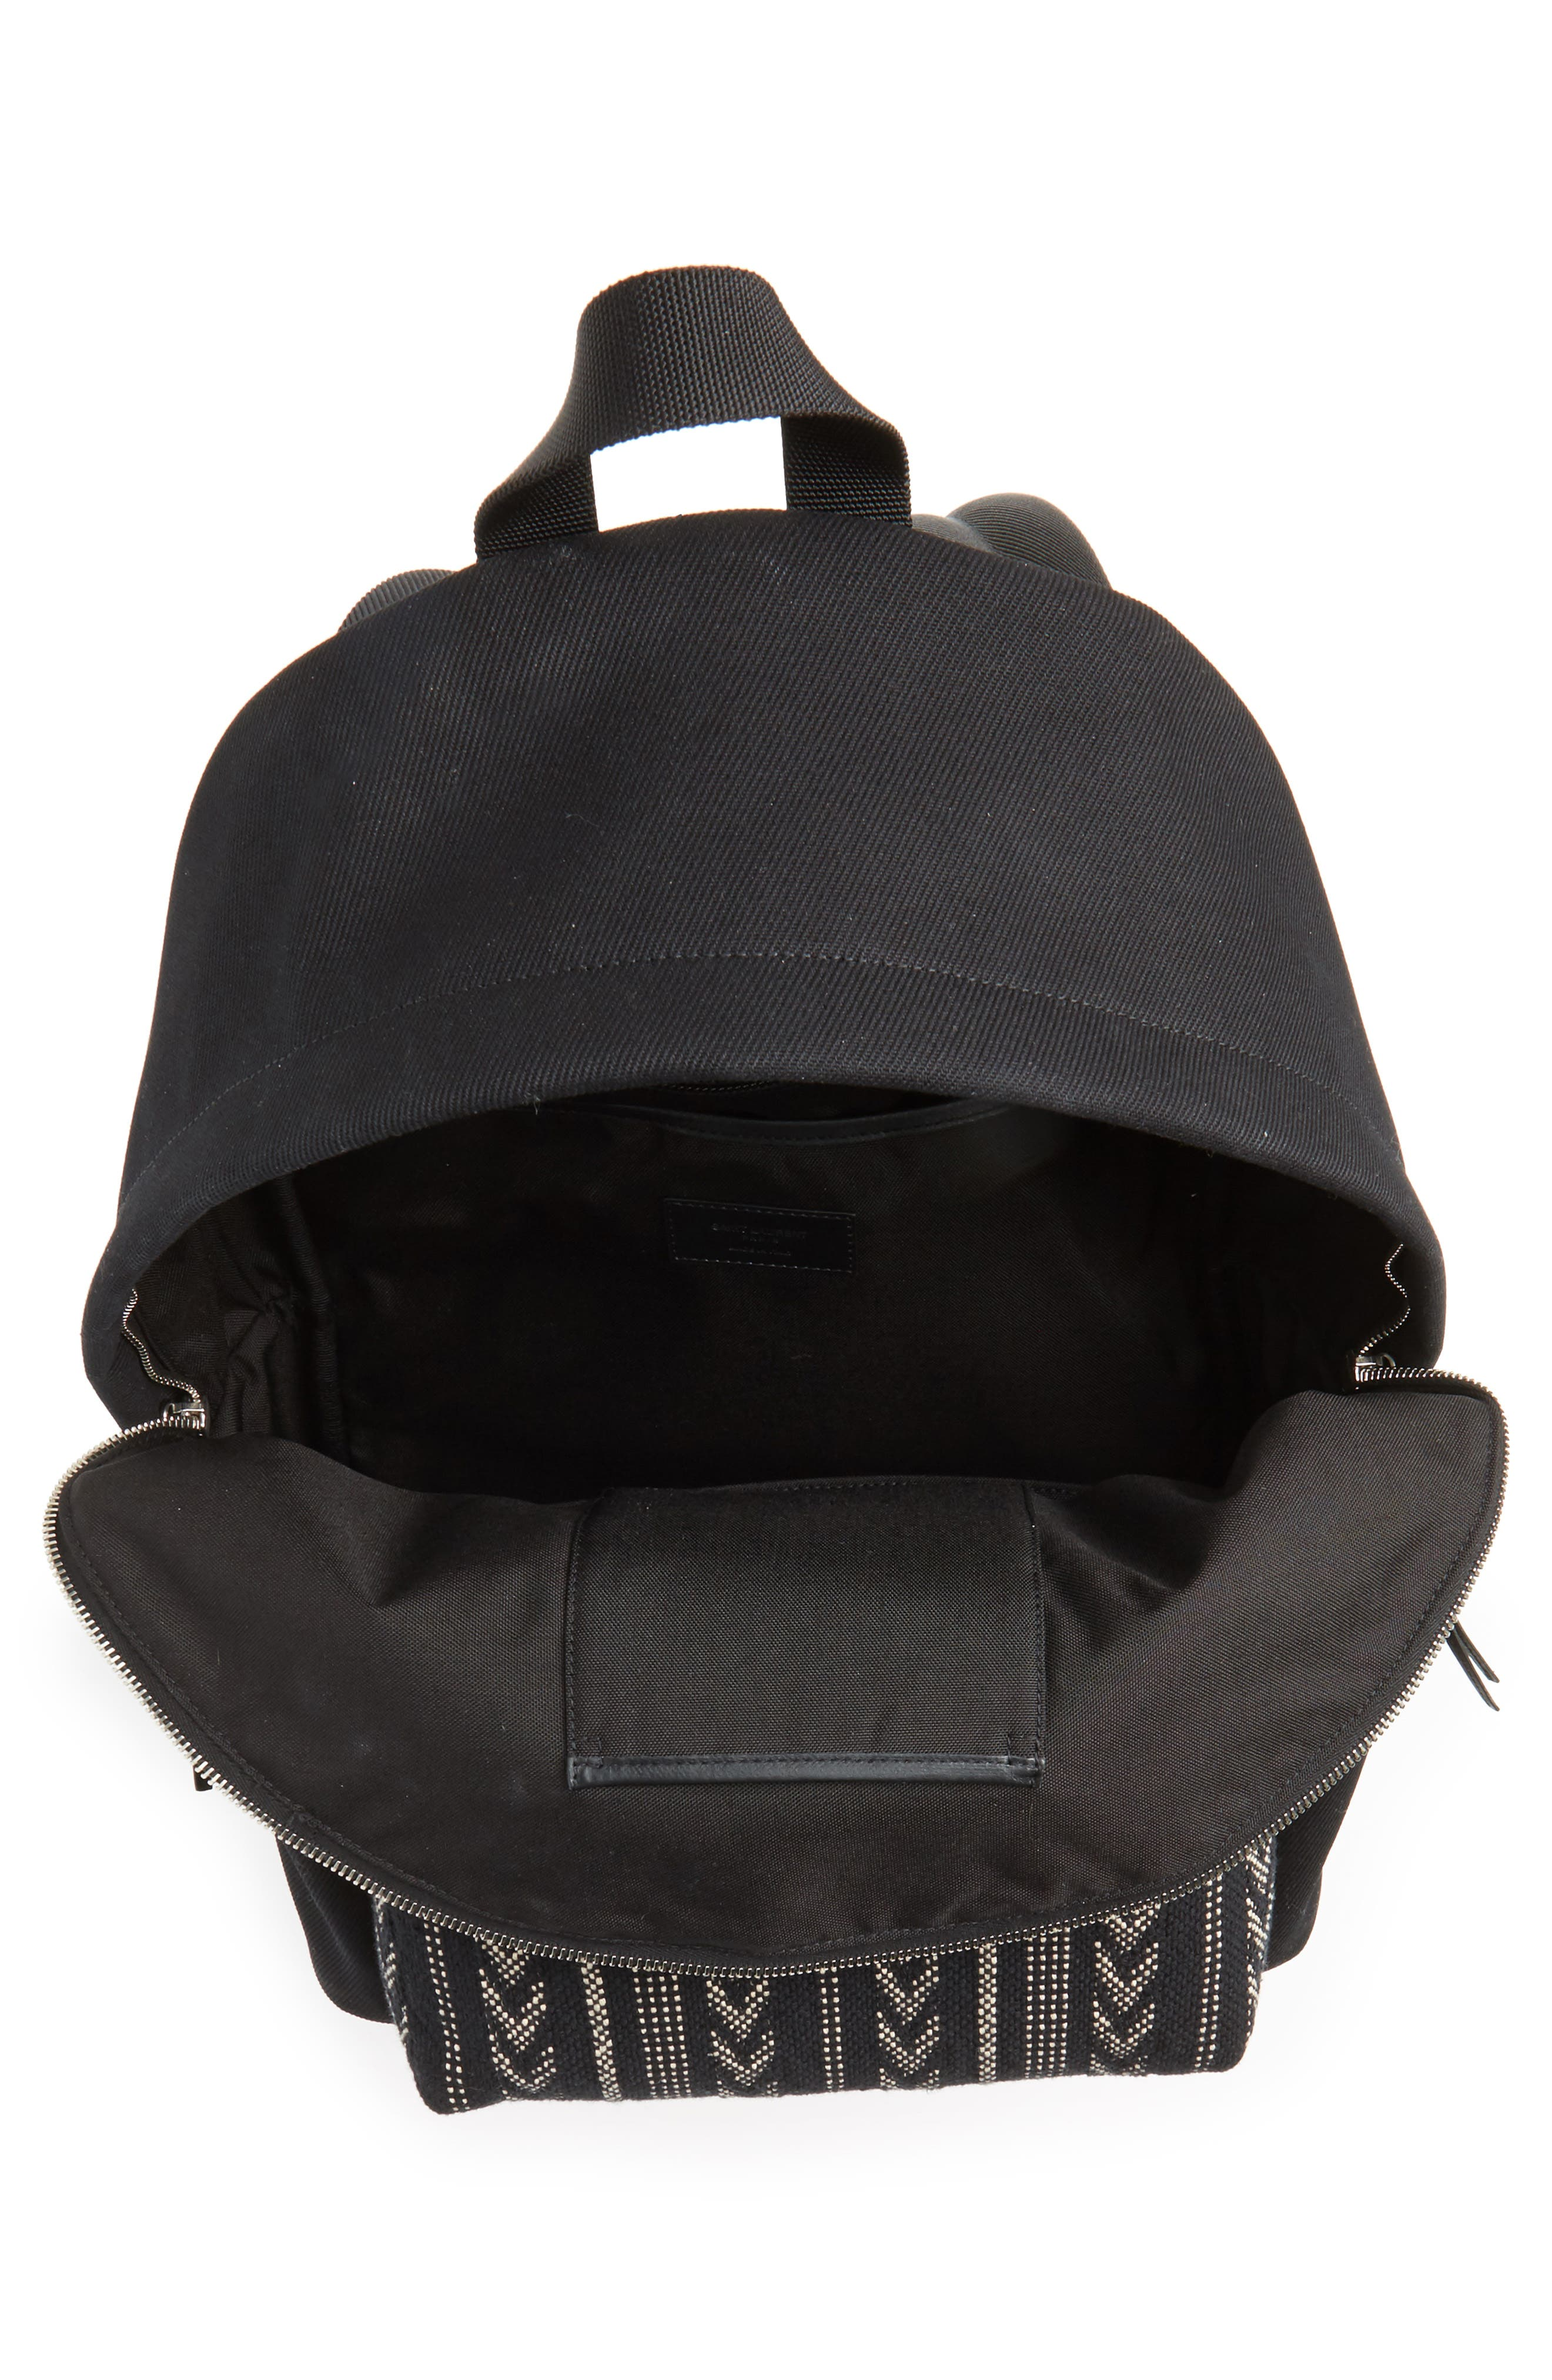 Pattern City Backpack,                             Alternate thumbnail 3, color,                             Black/ White